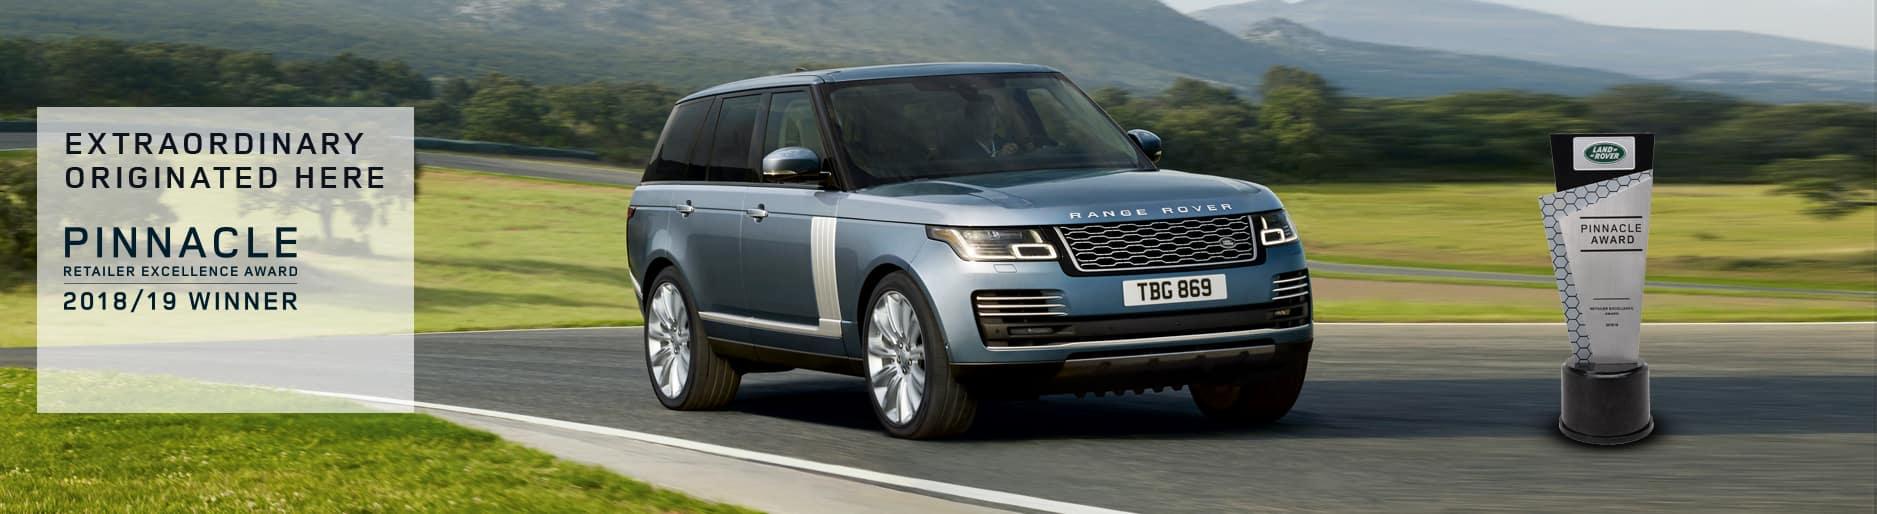 Land Rover Darien >> 2018 19 Land Rover Pinnacle Award Land Rover Darien